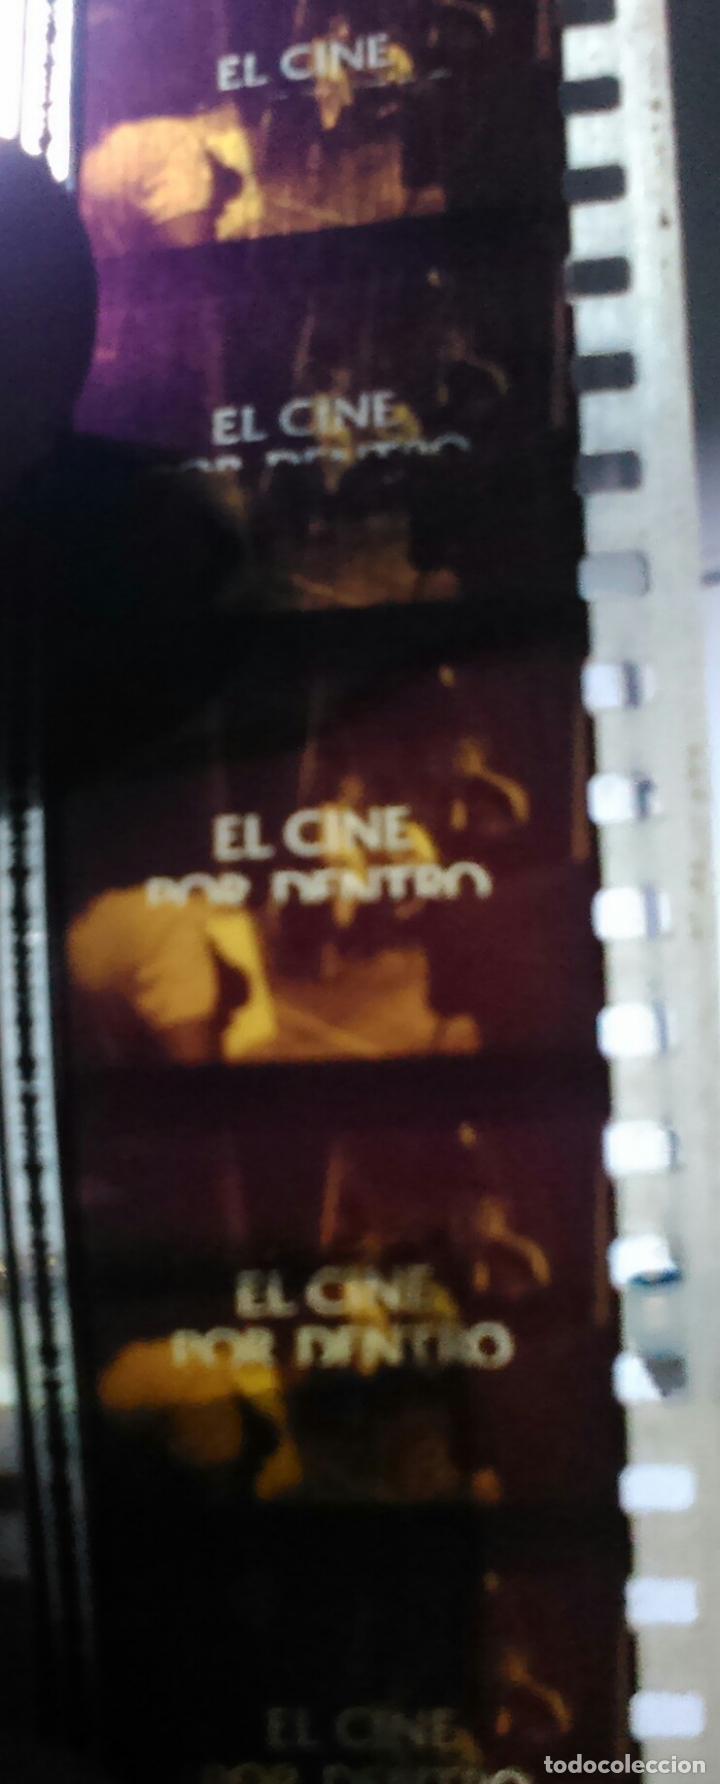 Cine: Rollo celuloide film película 35 mm, El cine por Dentro - Foto 2 - 137458190